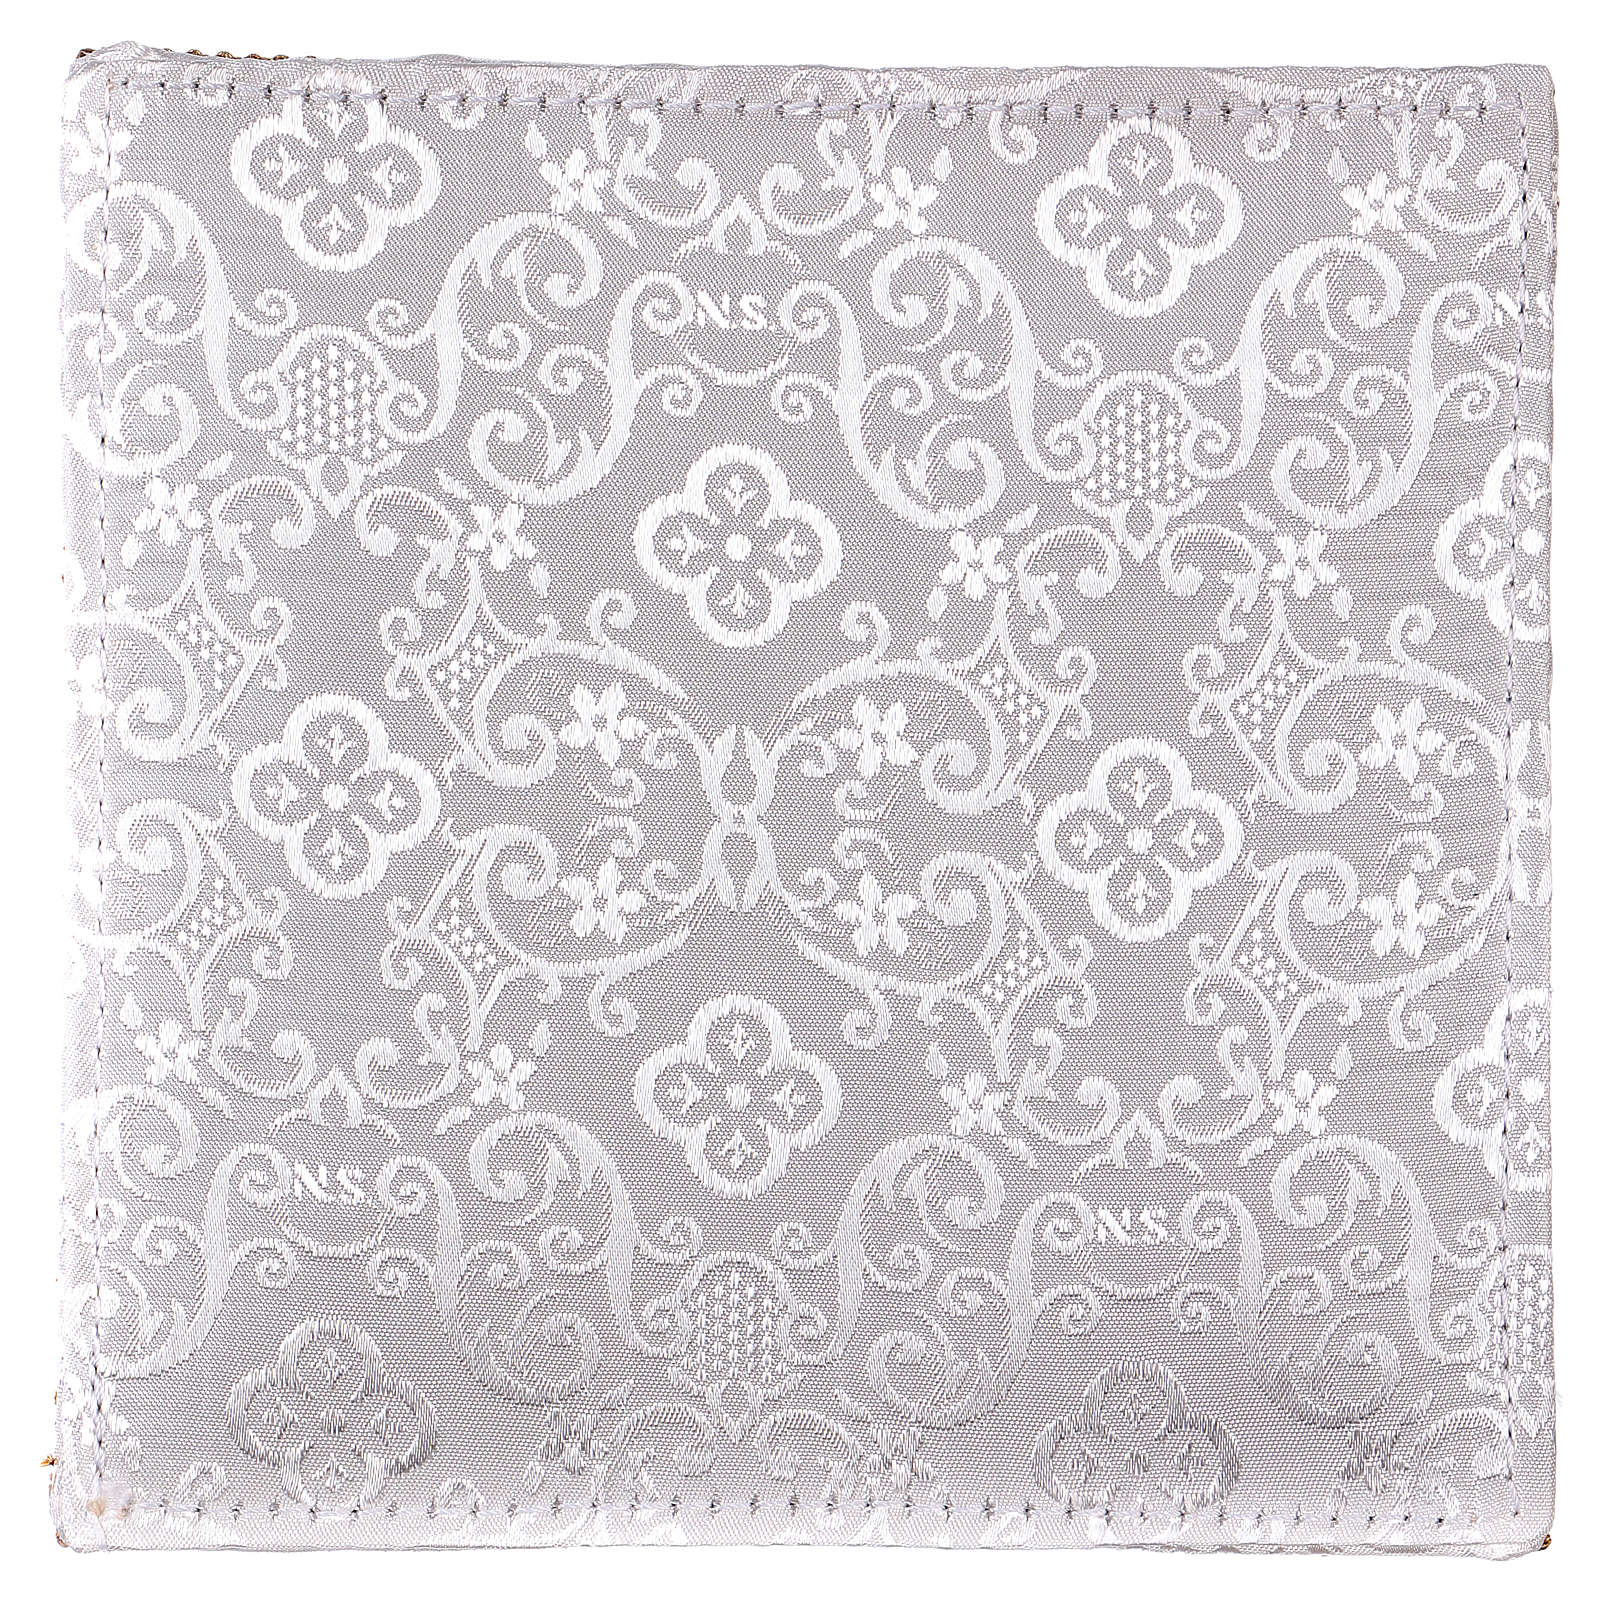 Chi-Rho chalice pall white jacquard 4